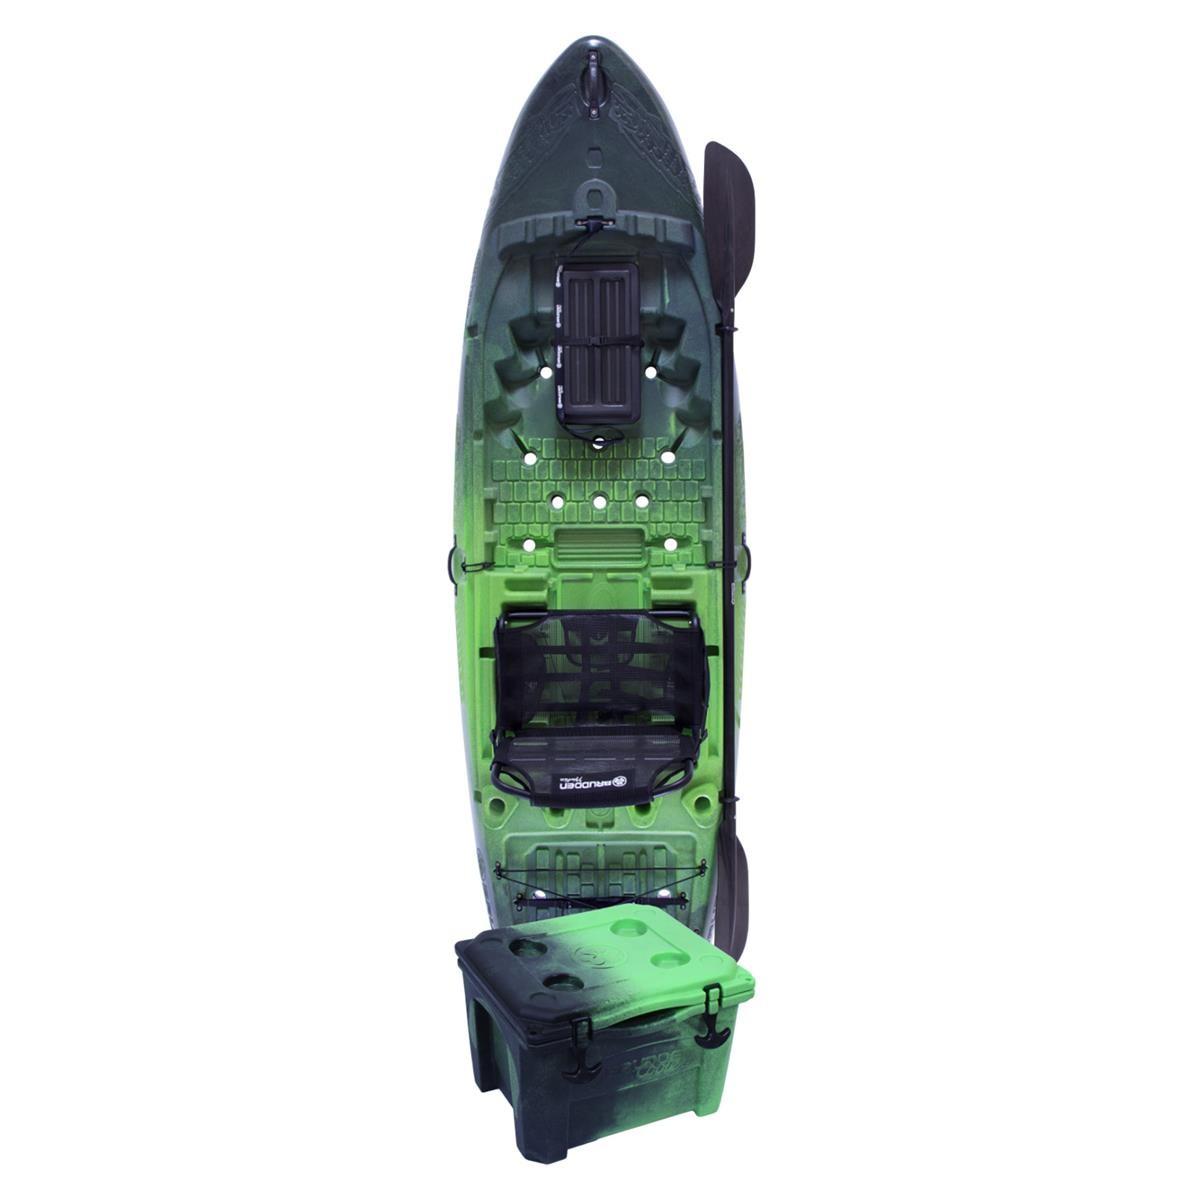 Caiaque para Pesca Brudden Náutica Hunter Fishing 285 Combo Profissional Verde Lima com Cooler 15LT